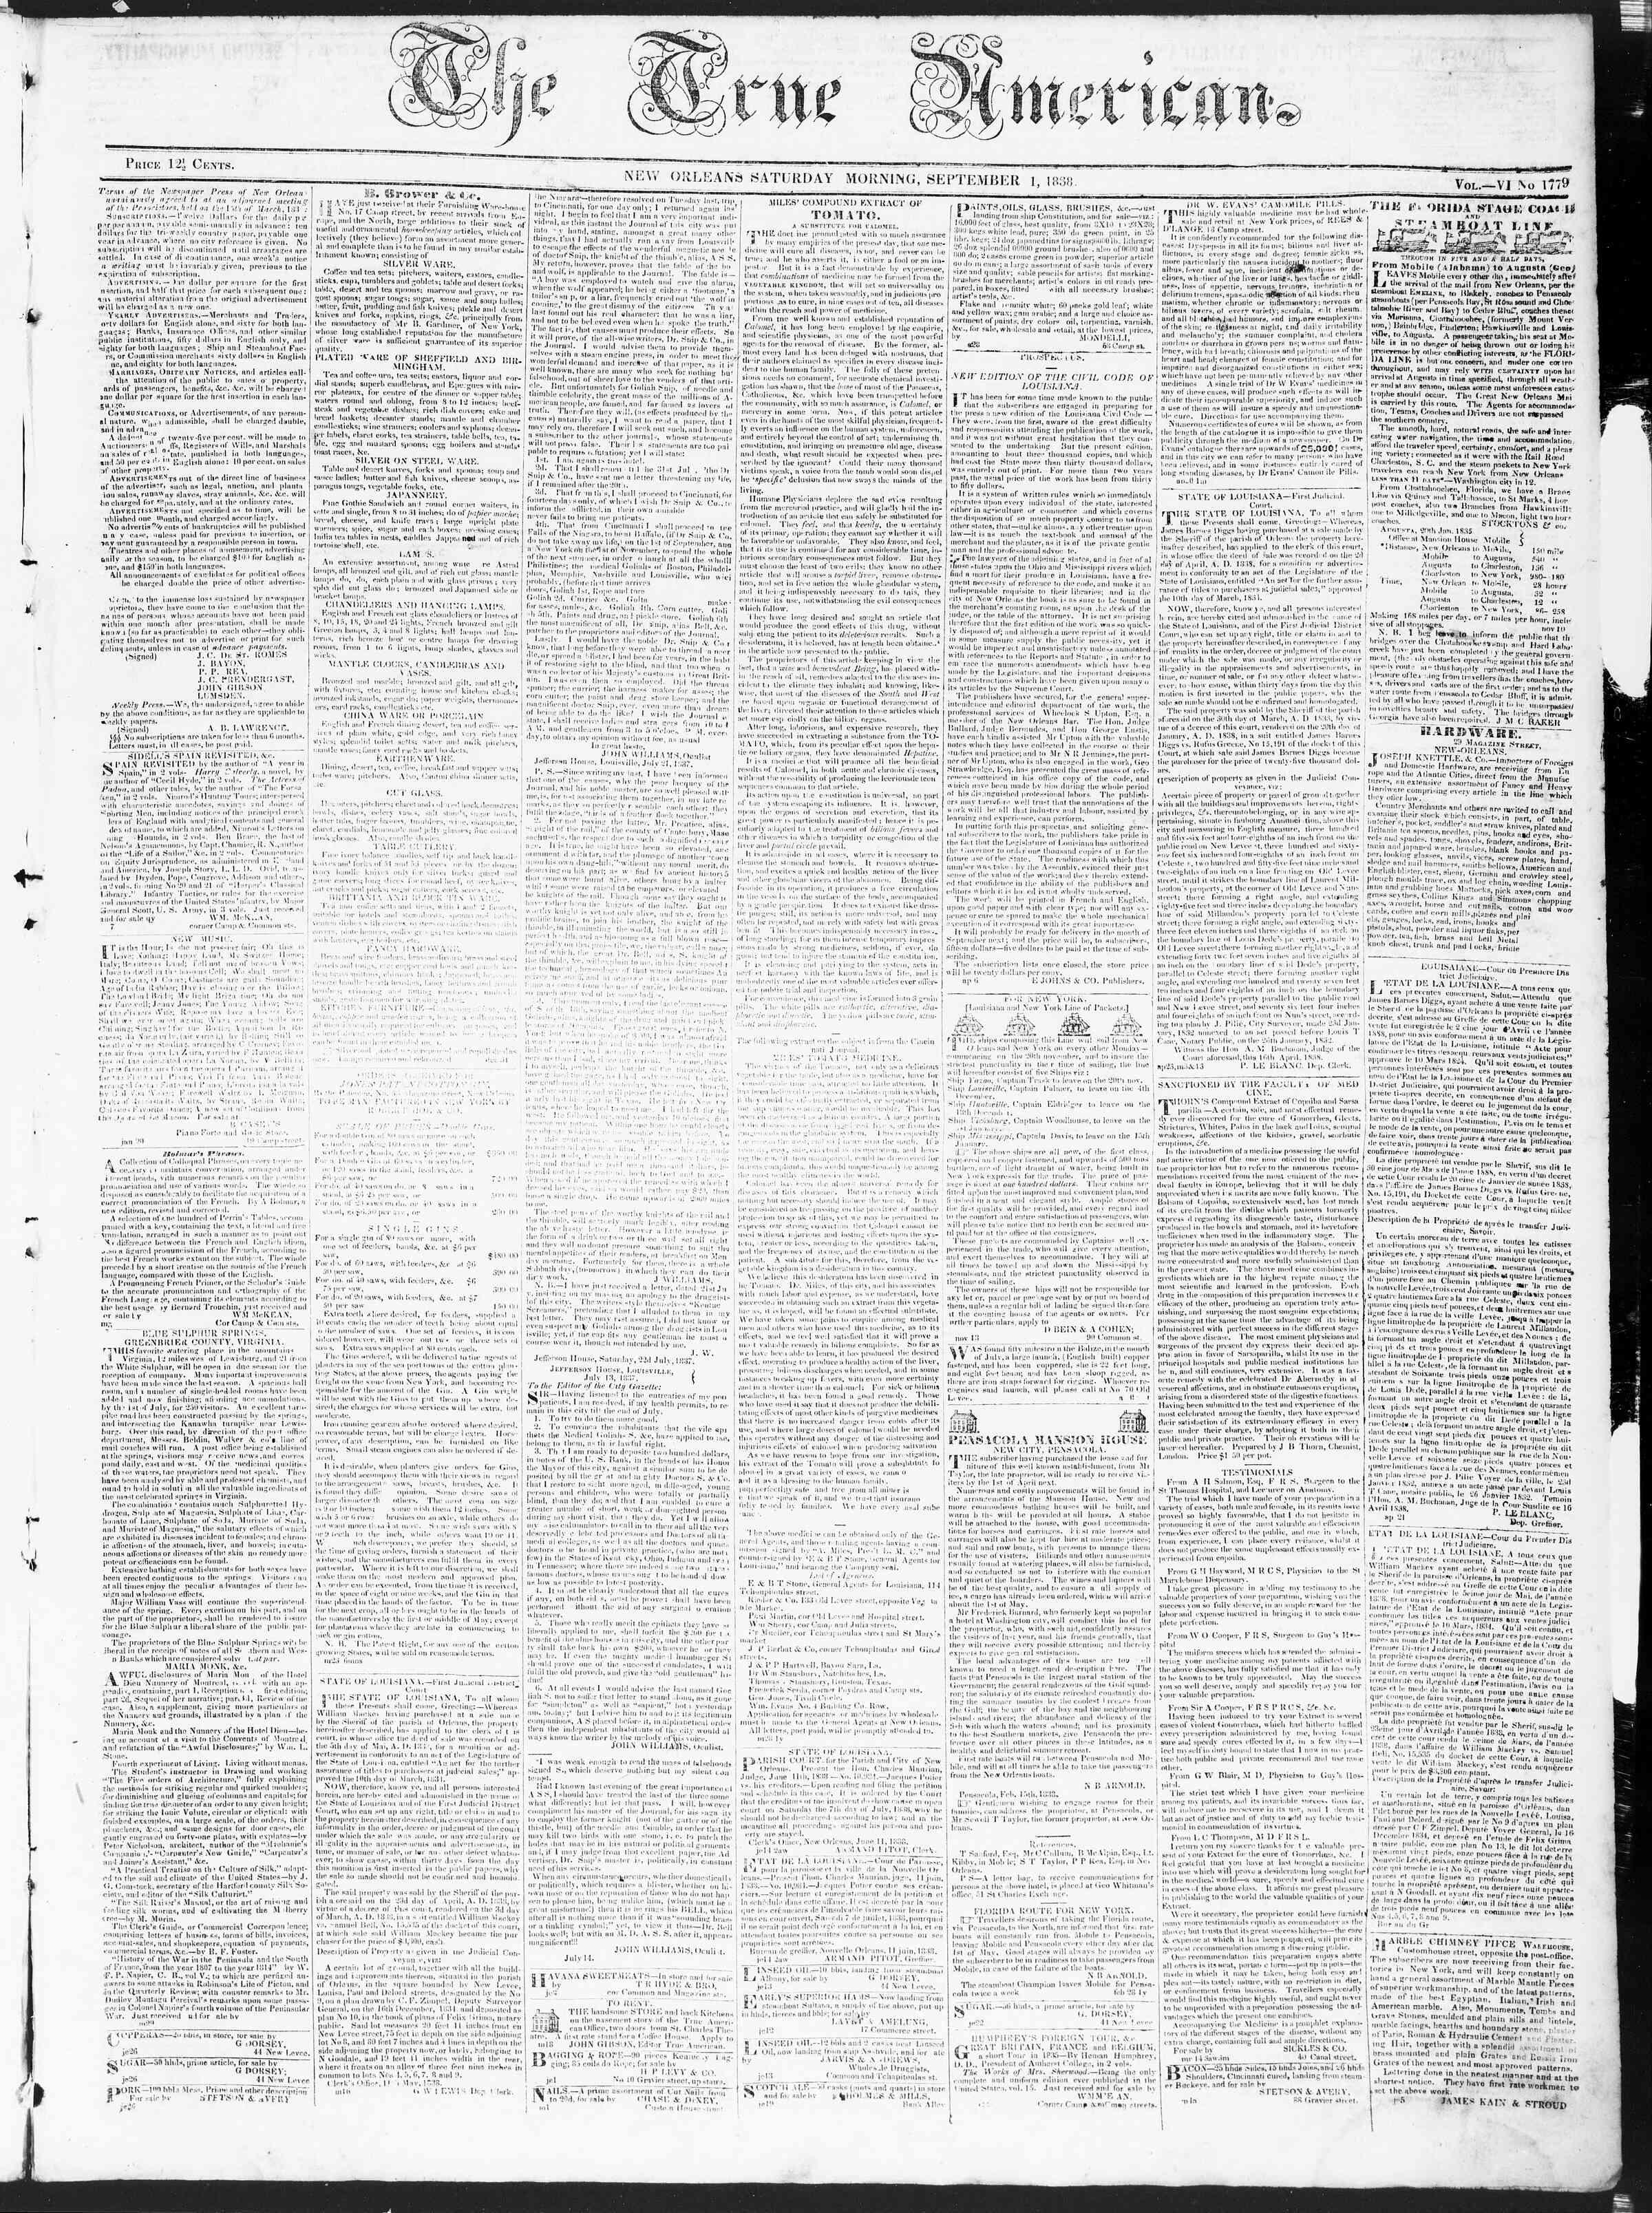 September 1, 1838 Tarihli True American Gazetesi Sayfa 1